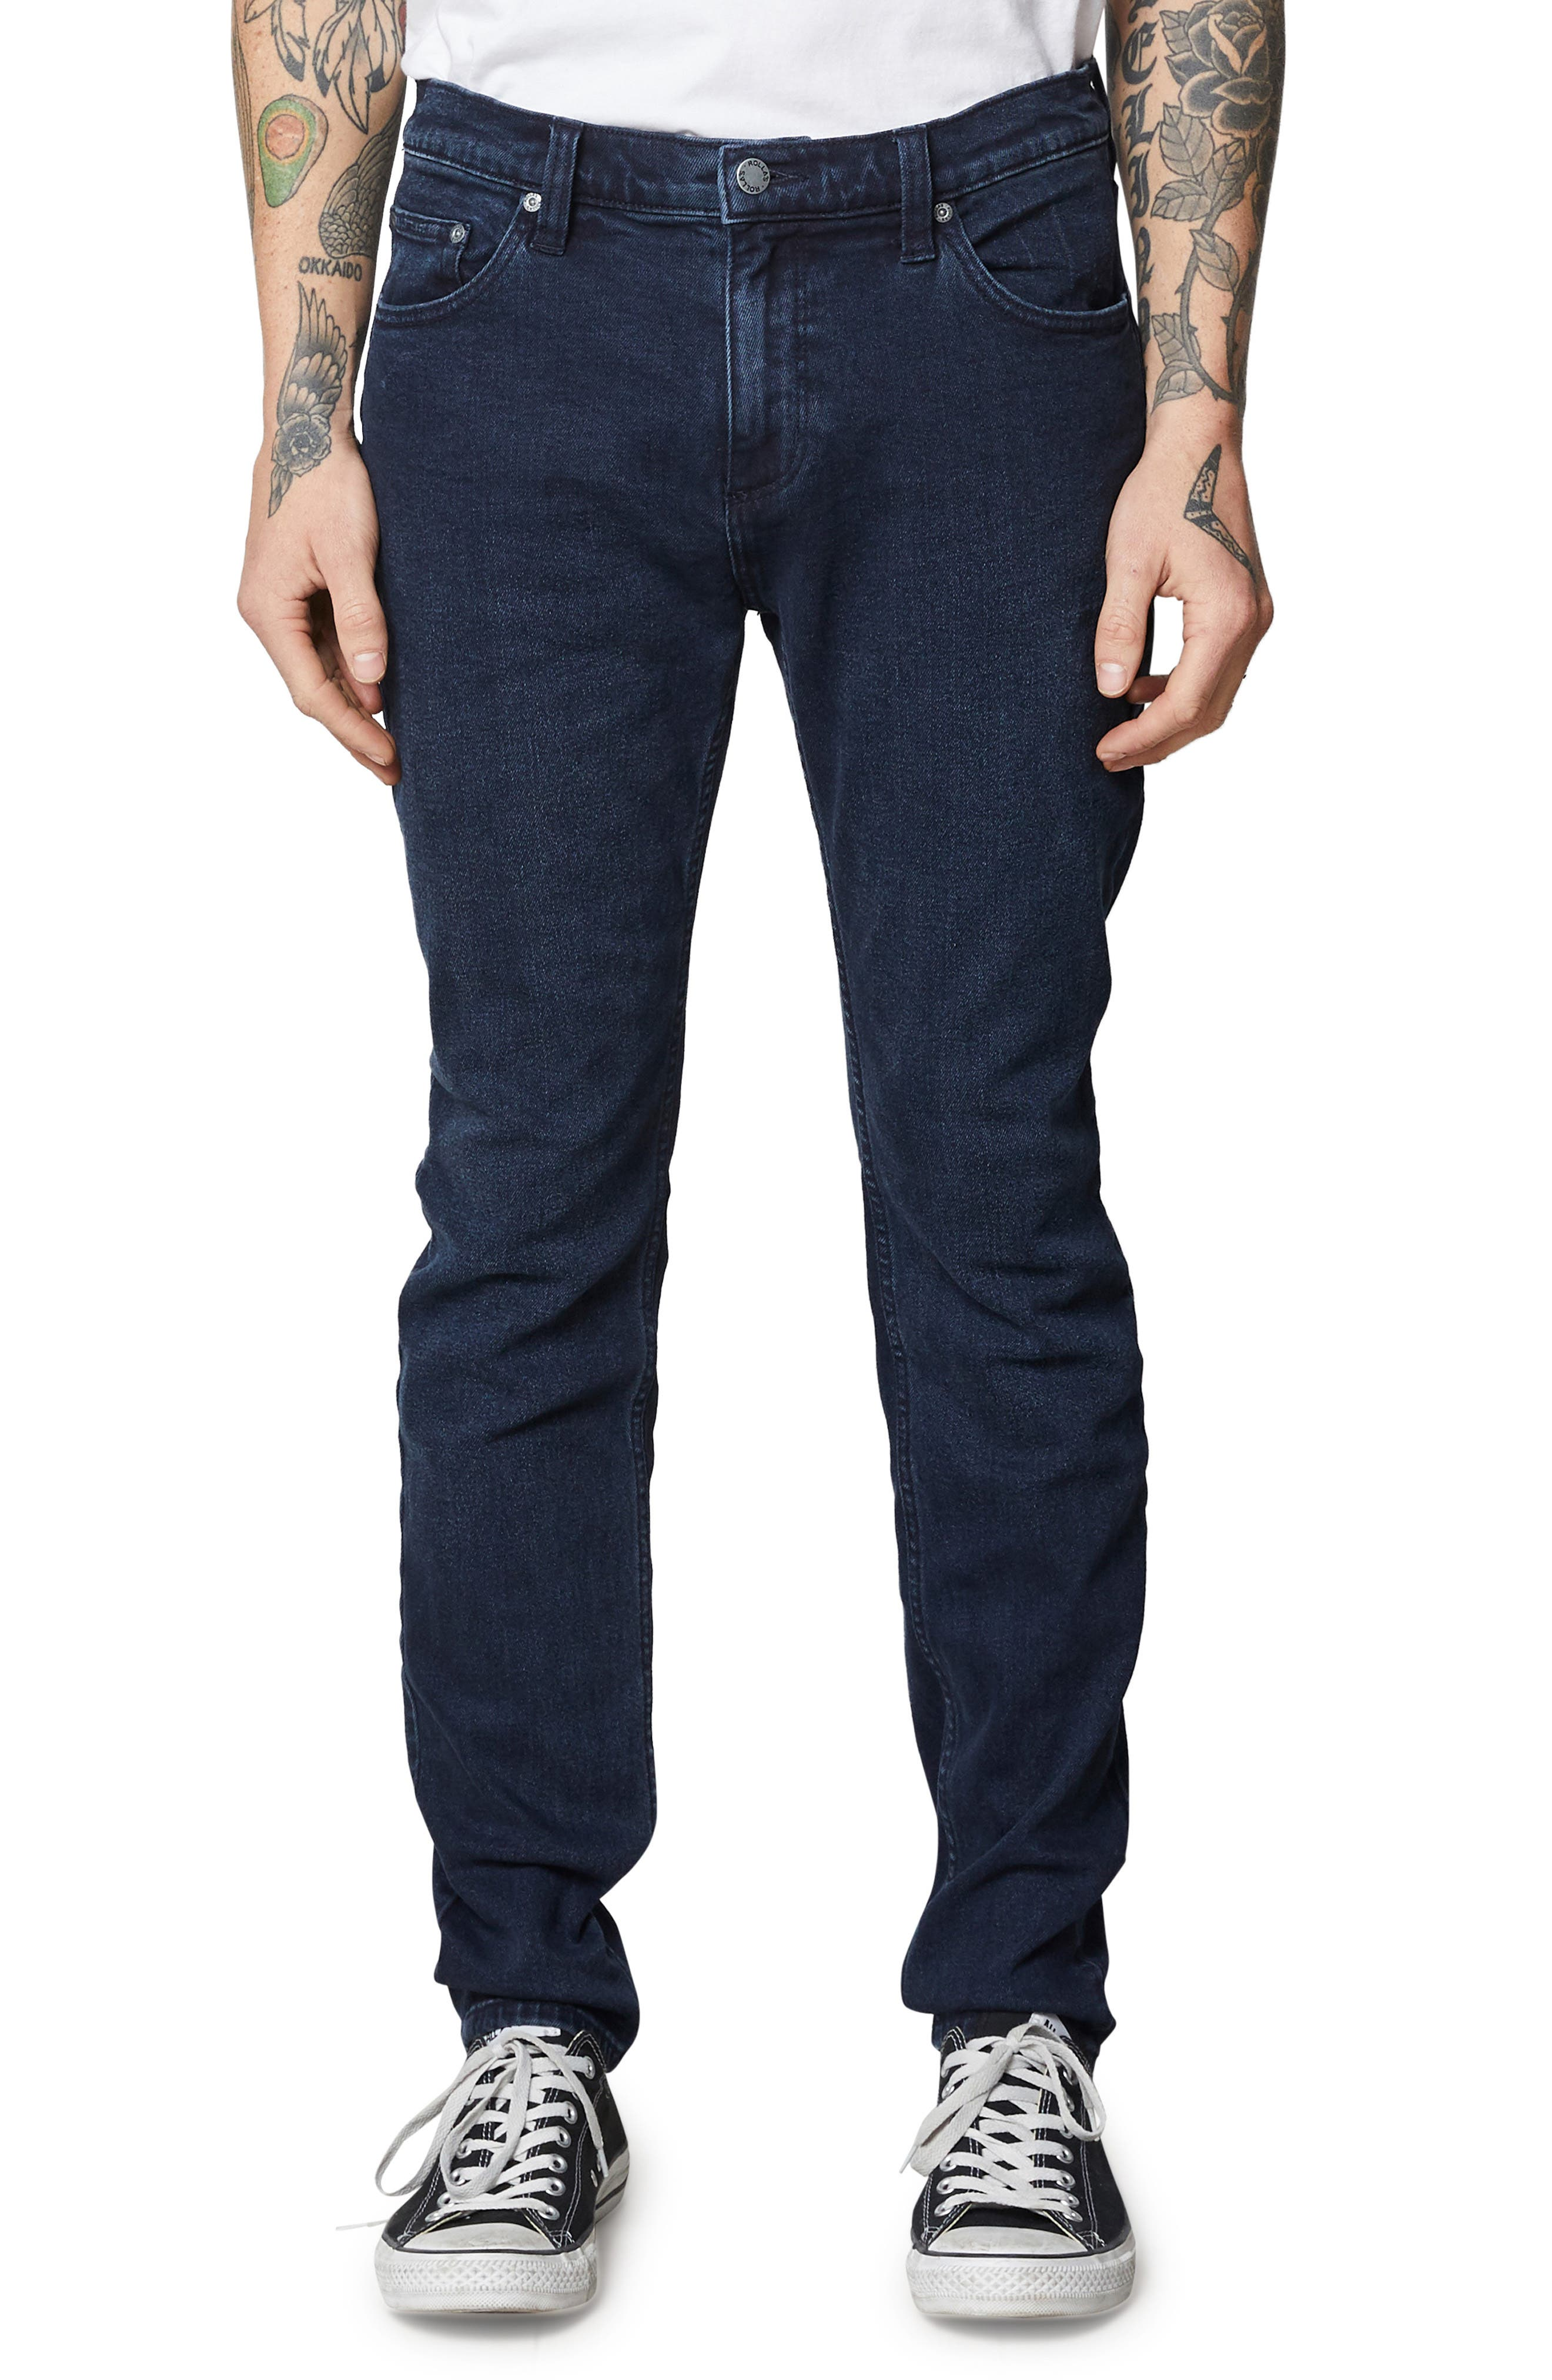 Stinger Skinny Fit Jeans,                         Main,                         color, STONE FREE BLACK